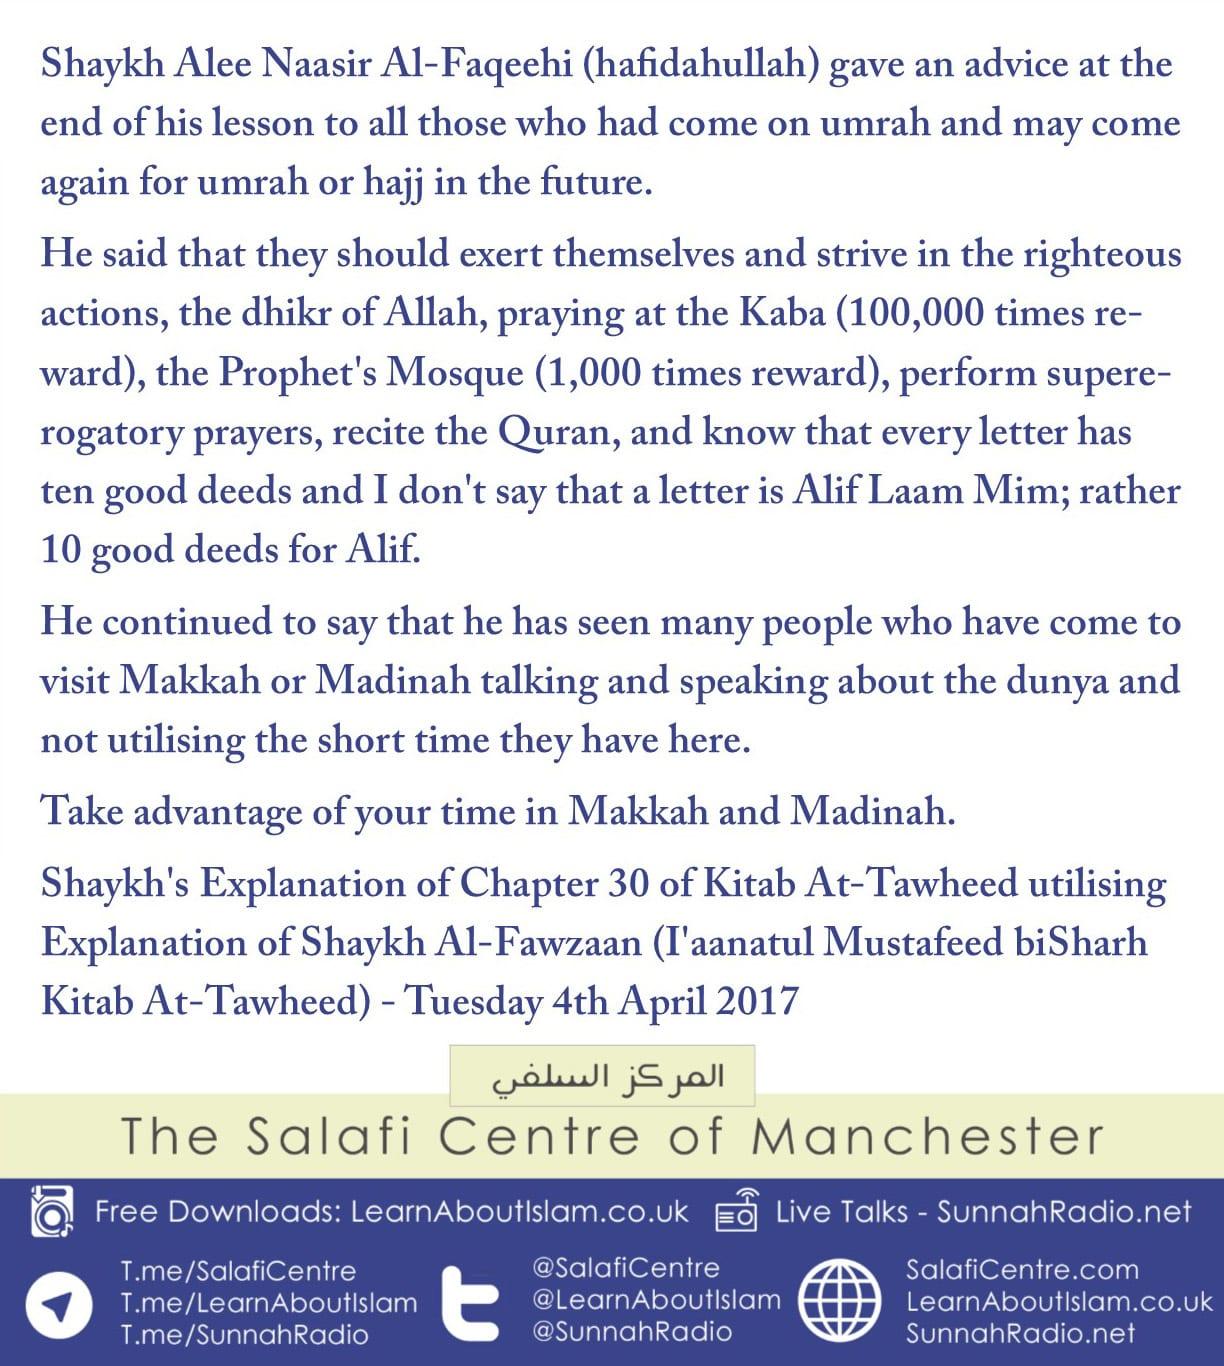 Shaykh-Alee-Nasir advice